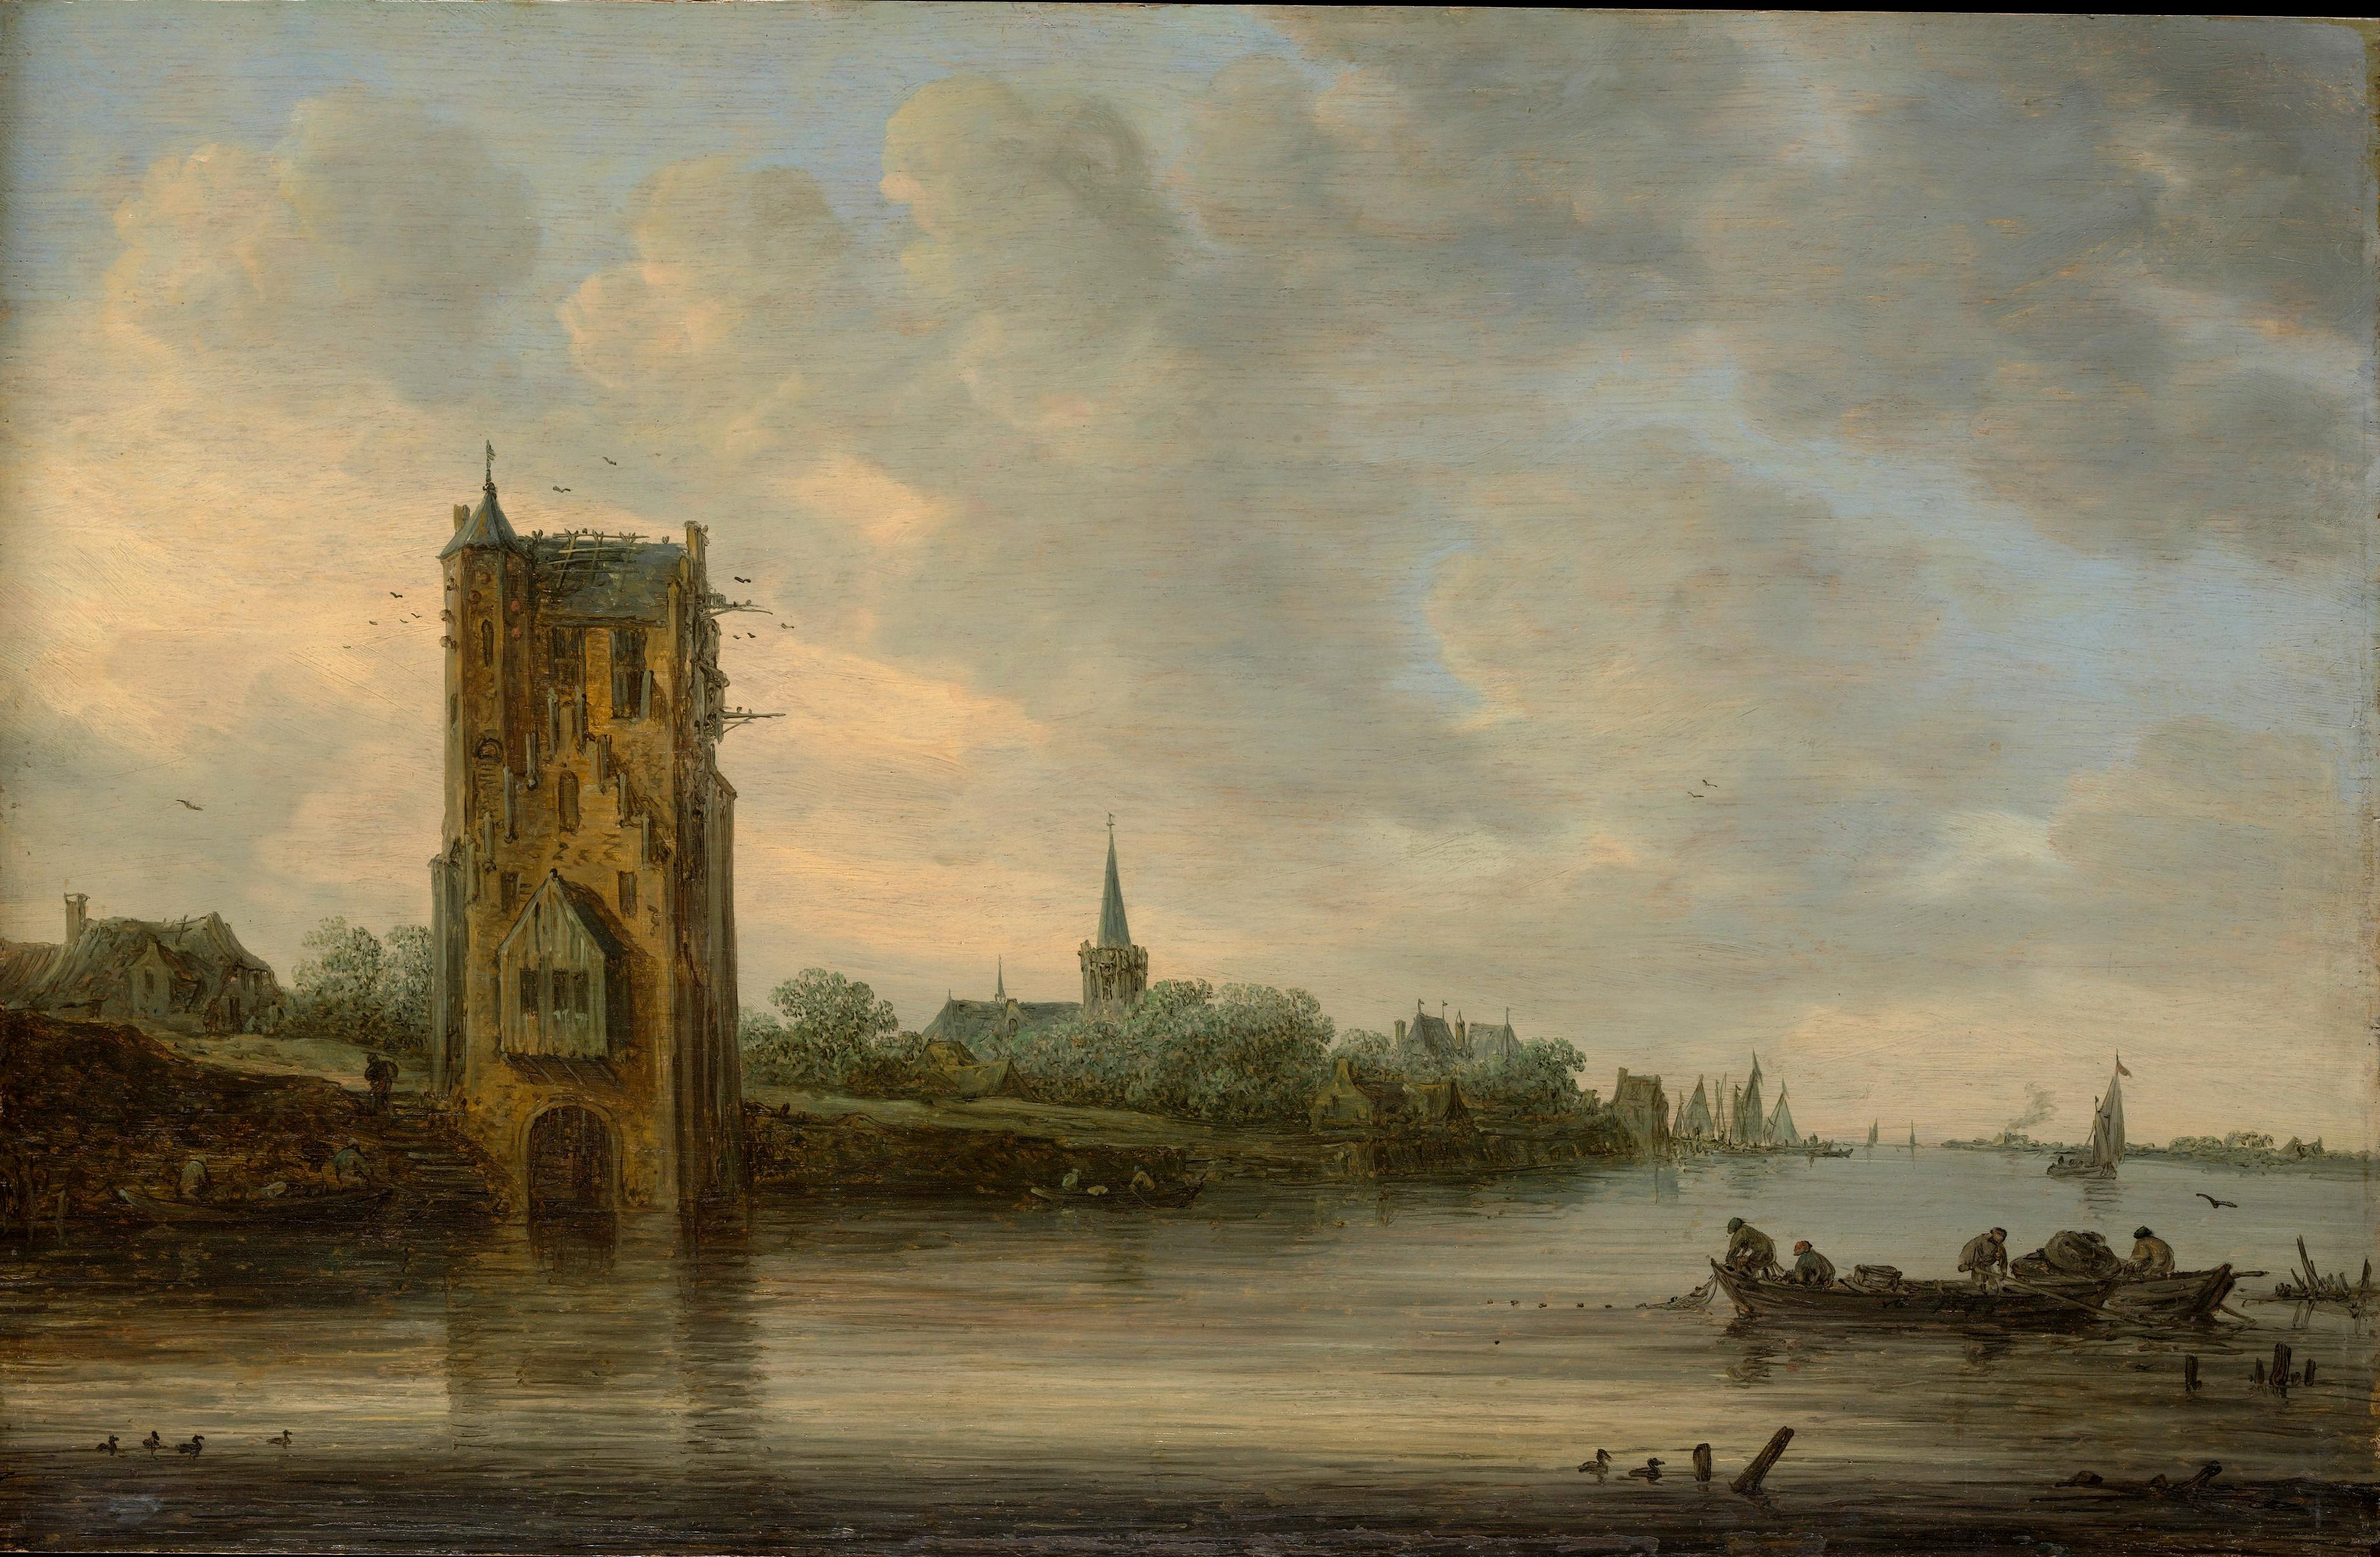 Jan van Goyen – The Metropolitan Museum of Art 45.146.3. Title: The Pelkus Gate near Utrecht. Date: c. 1646. Materials: oil on panel. Dimensions: 36.8 x 57.2 cm. Acquisition date: 1945. Nr.: 45.146.3. Source: http://images.metmuseum.org/CRDImages/ep/original/DP145926.jpg. I have changed the light of the original photo.